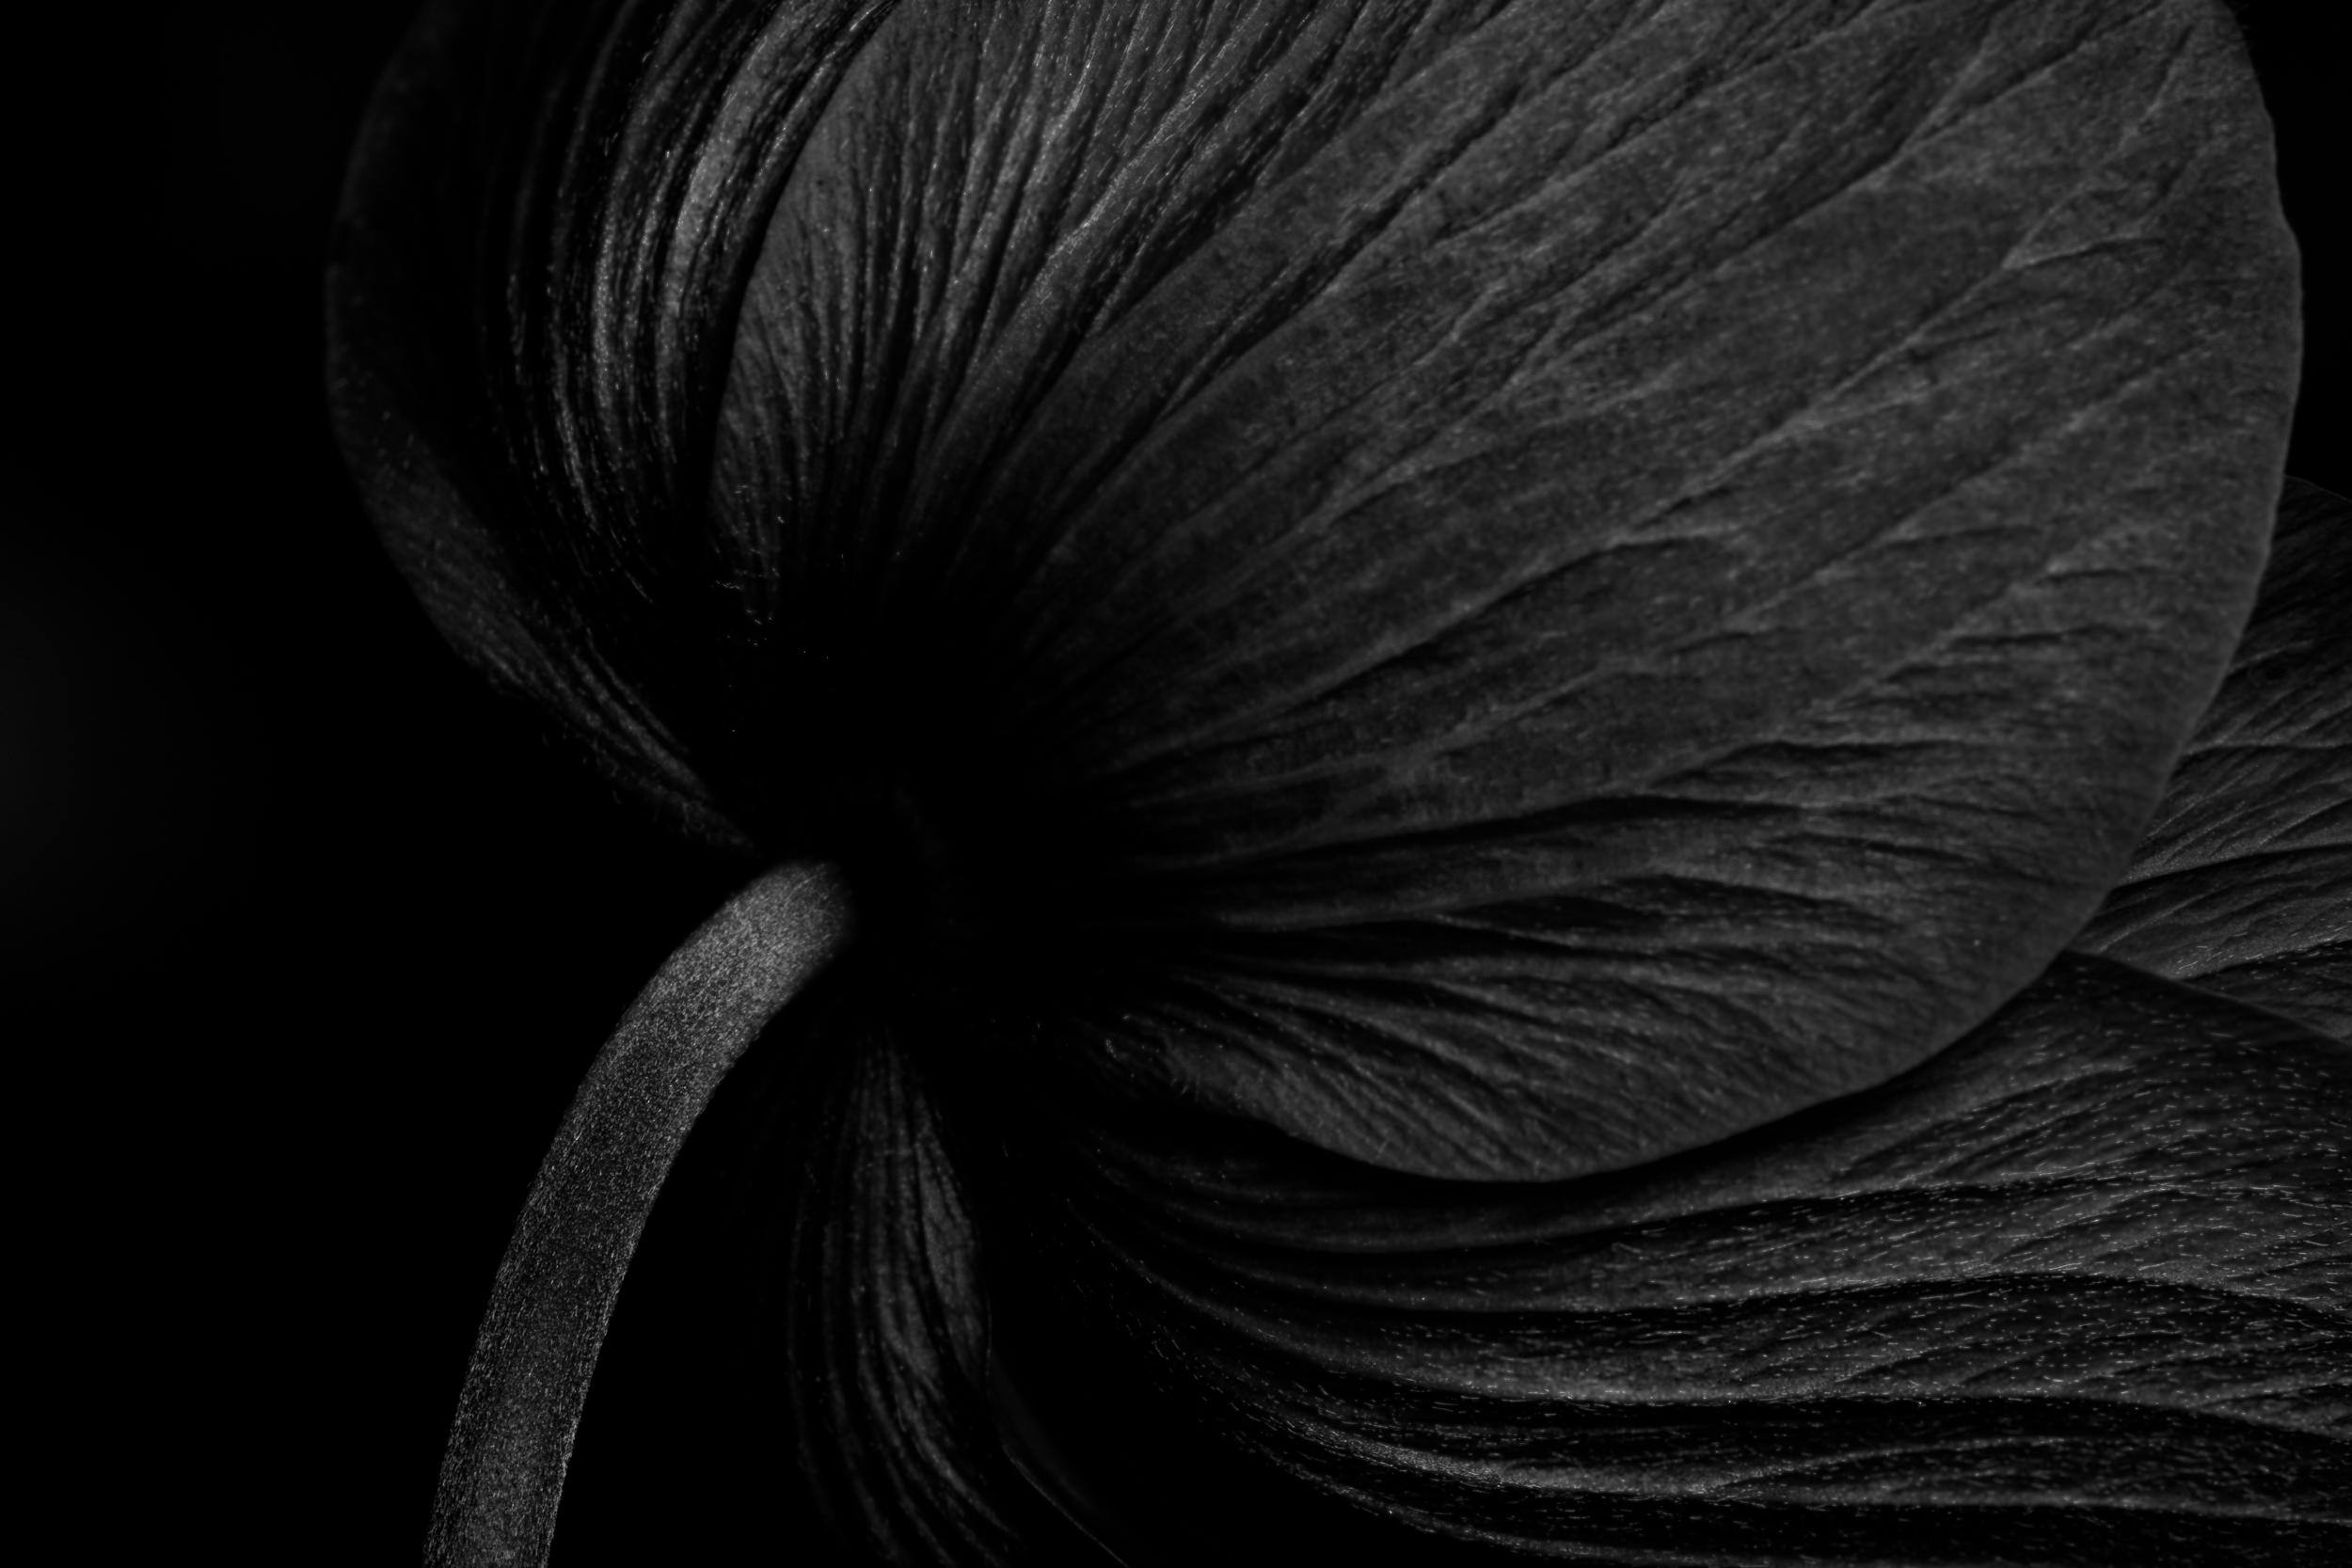 black white flower silhouettes